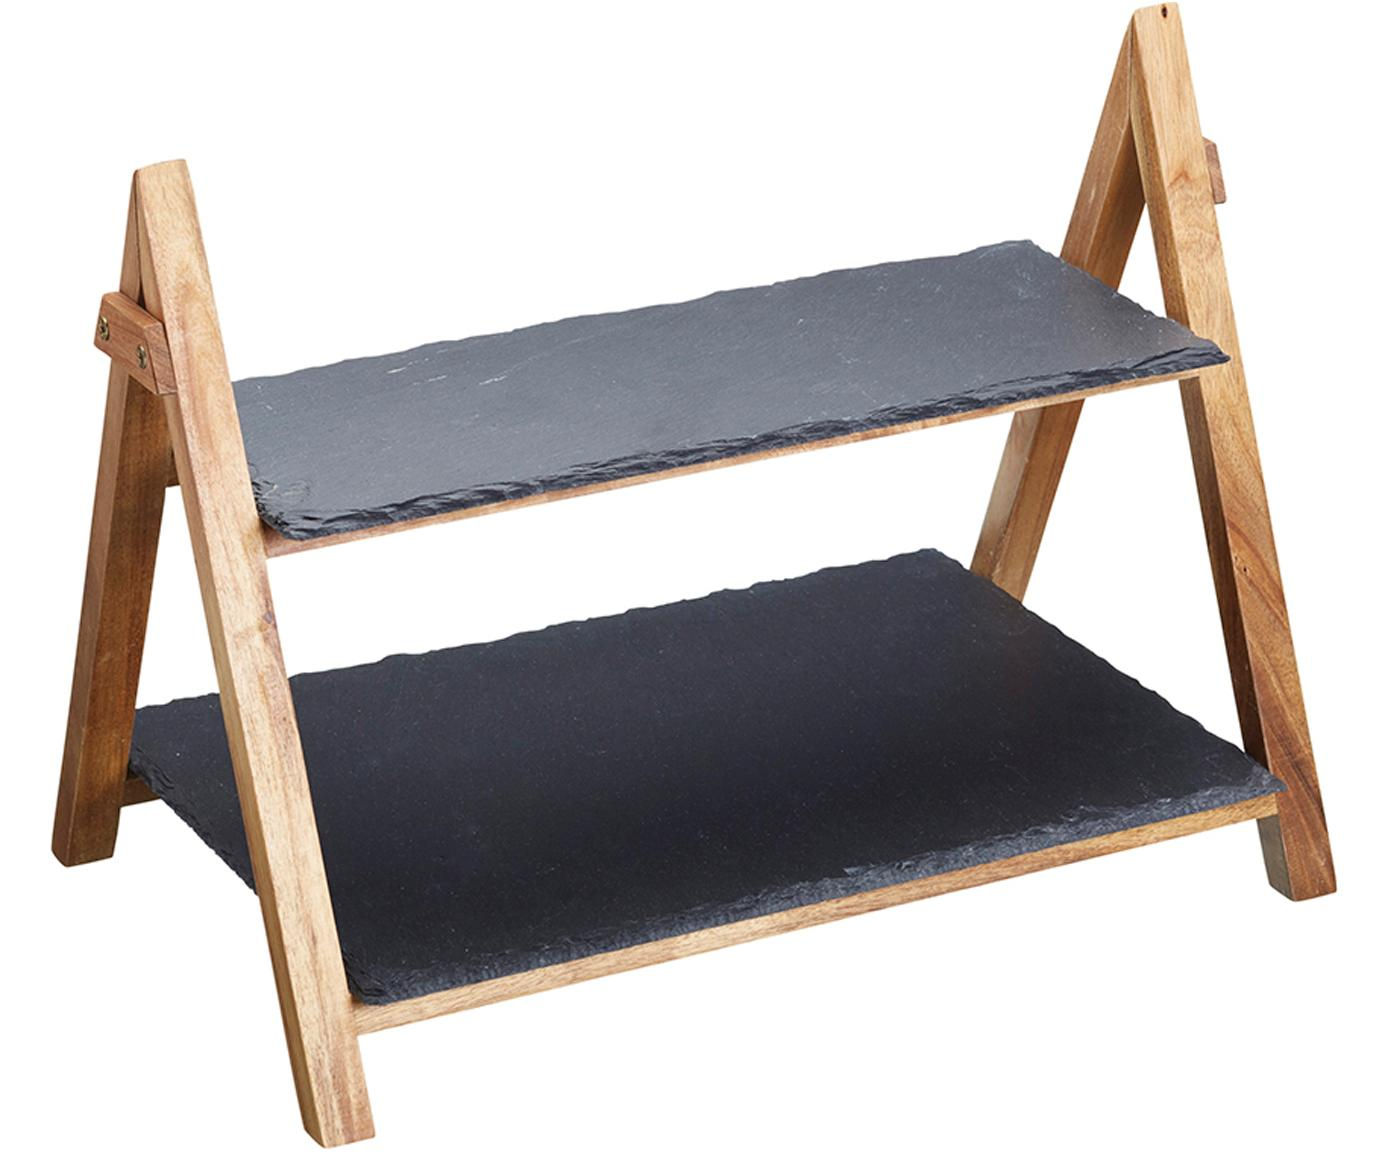 Etagère Dark, Frame: hout, Plateaus: leisteen, Antraciet, houtkleurig, 40 x 34 cm